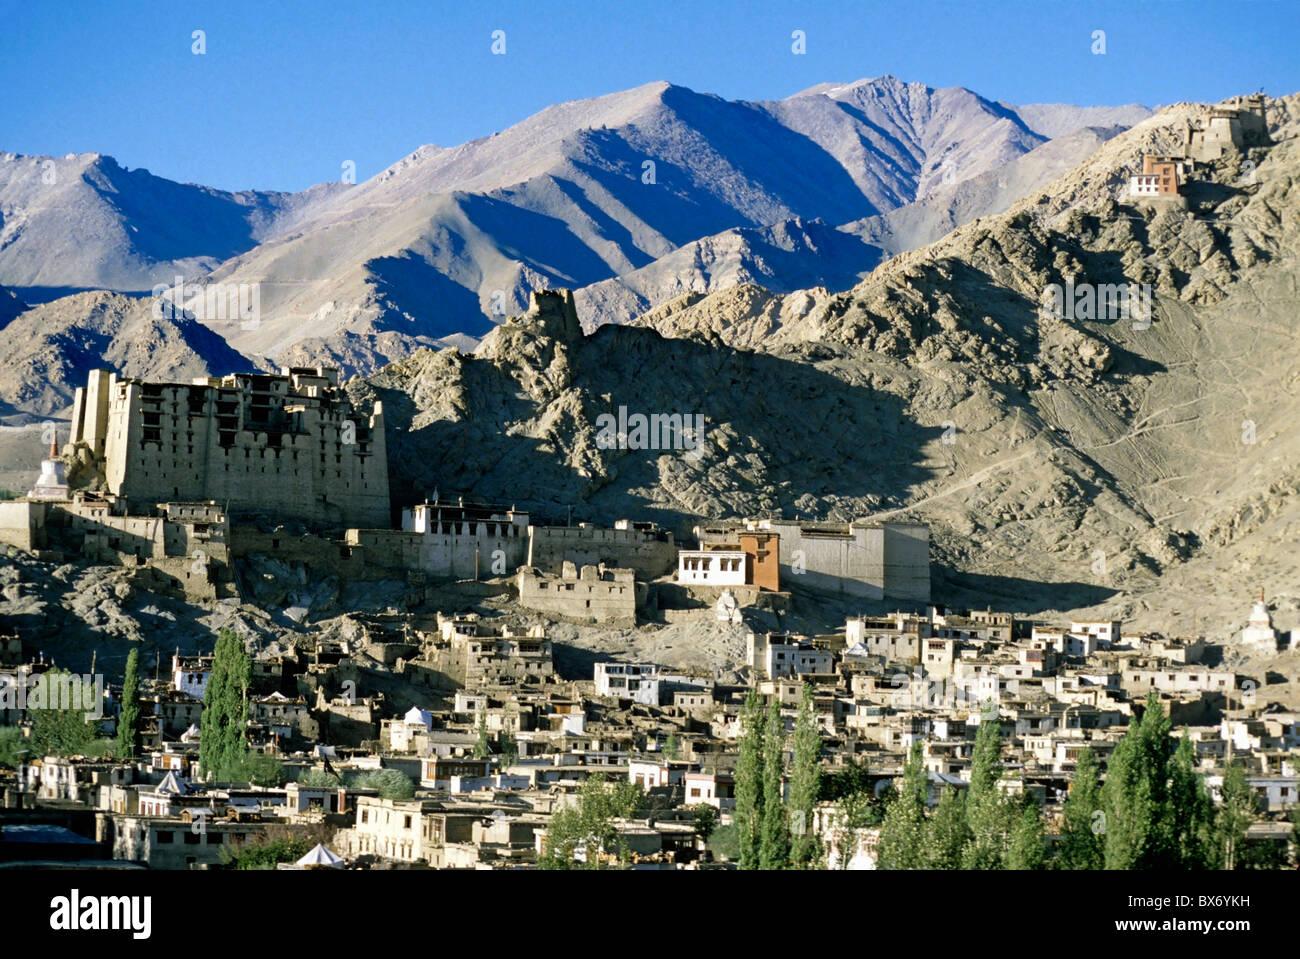 Leh Palace overlooking the town, Leh, Ladakh, India. - Stock Image